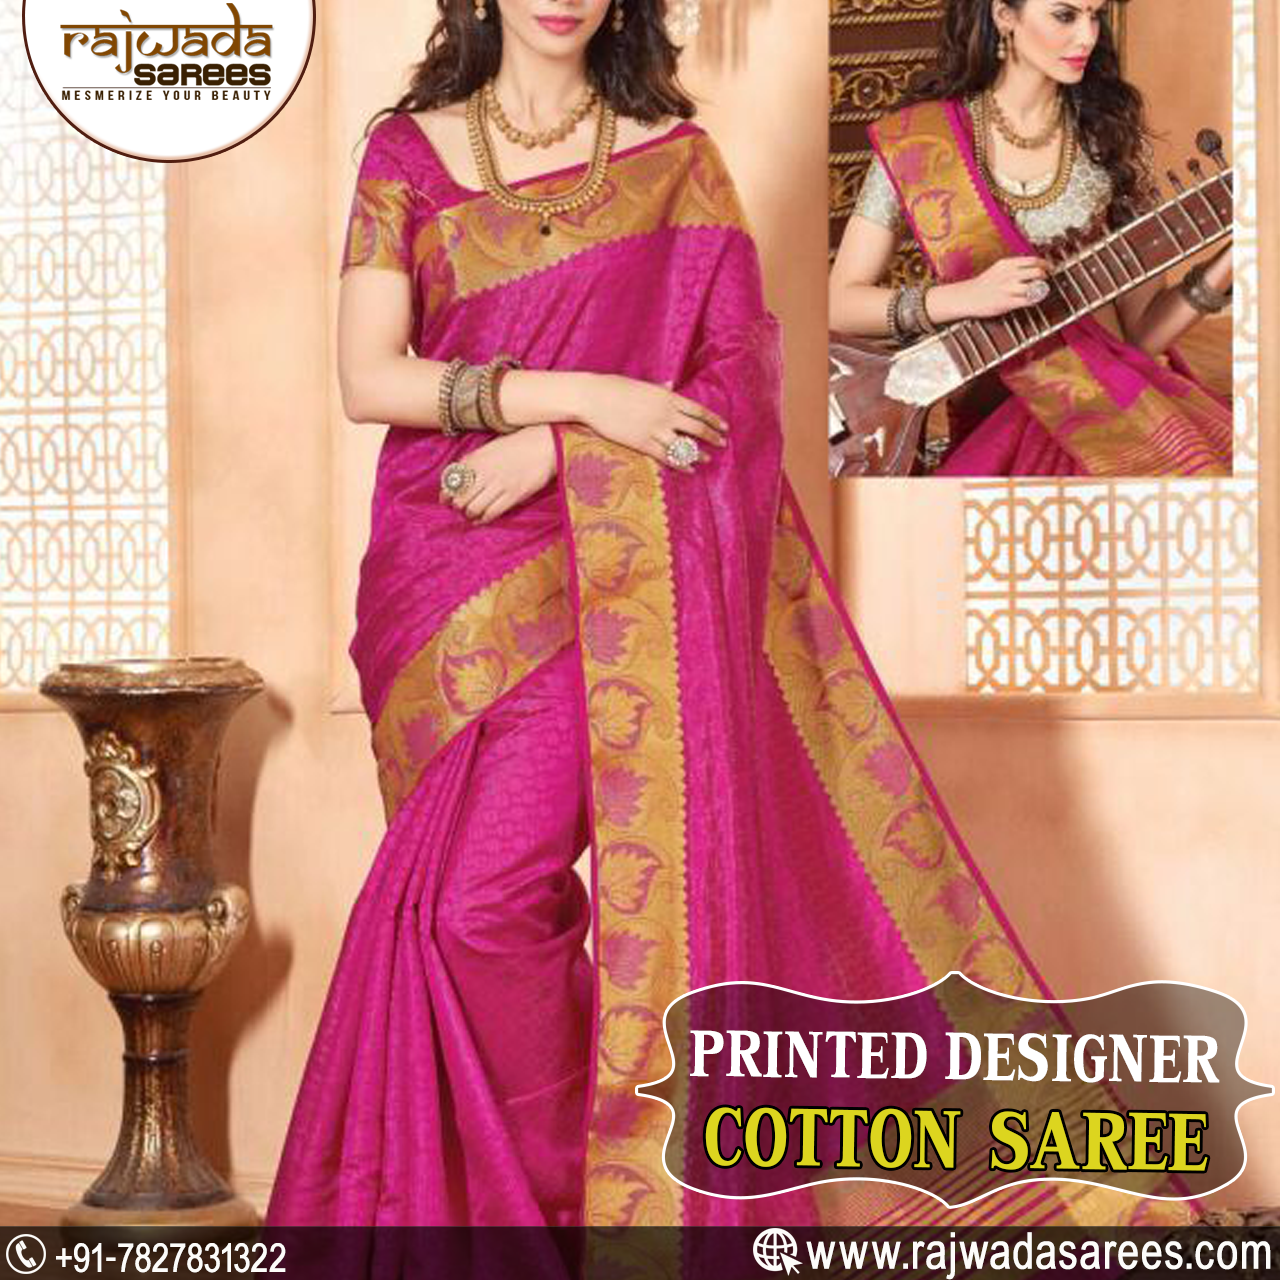 Saree blouse design for cotton saree beautiful designer collection of printed cotton sarees available